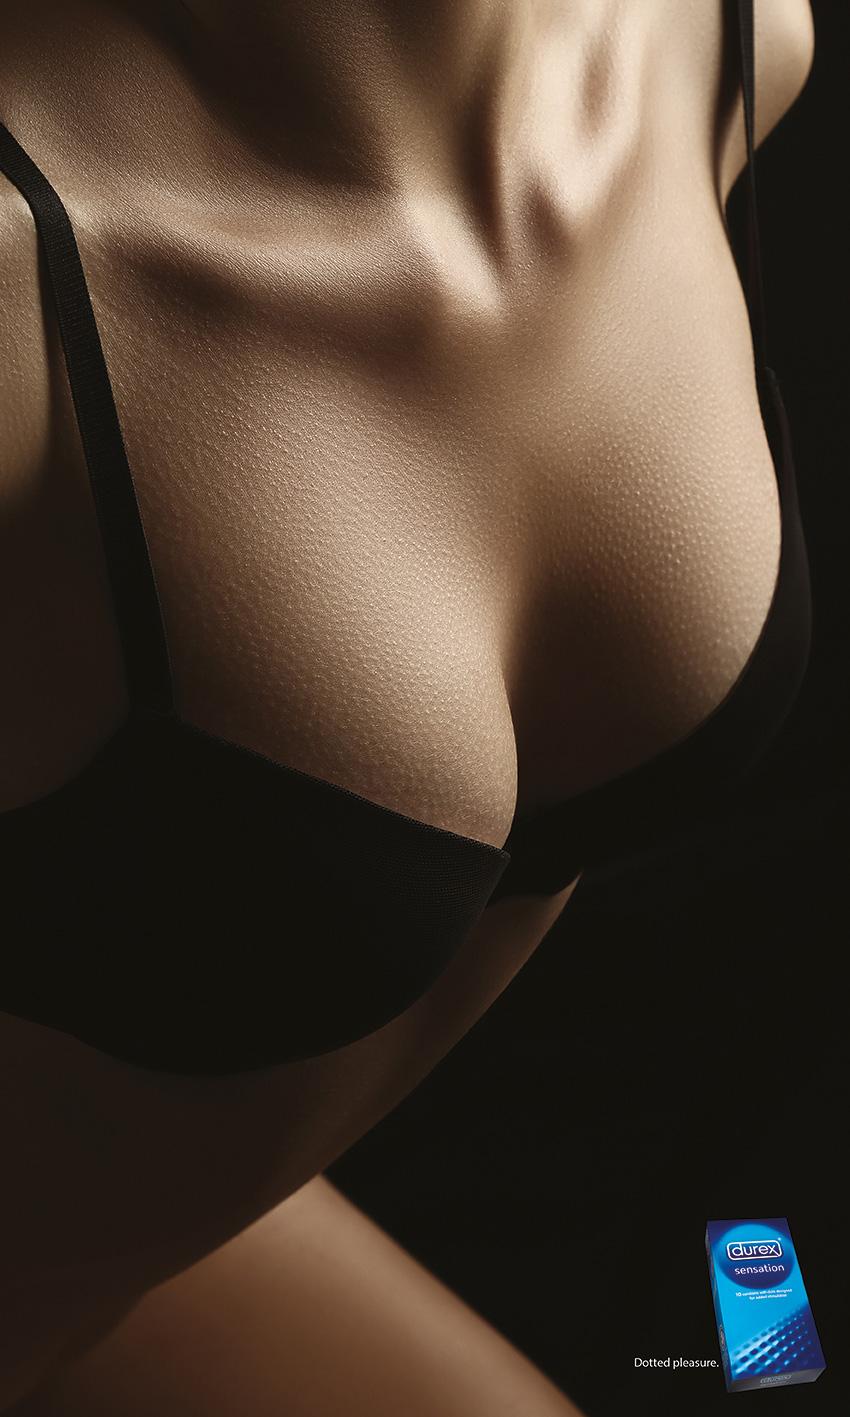 Durex-dotted-pleasure-Cleavage-cotw